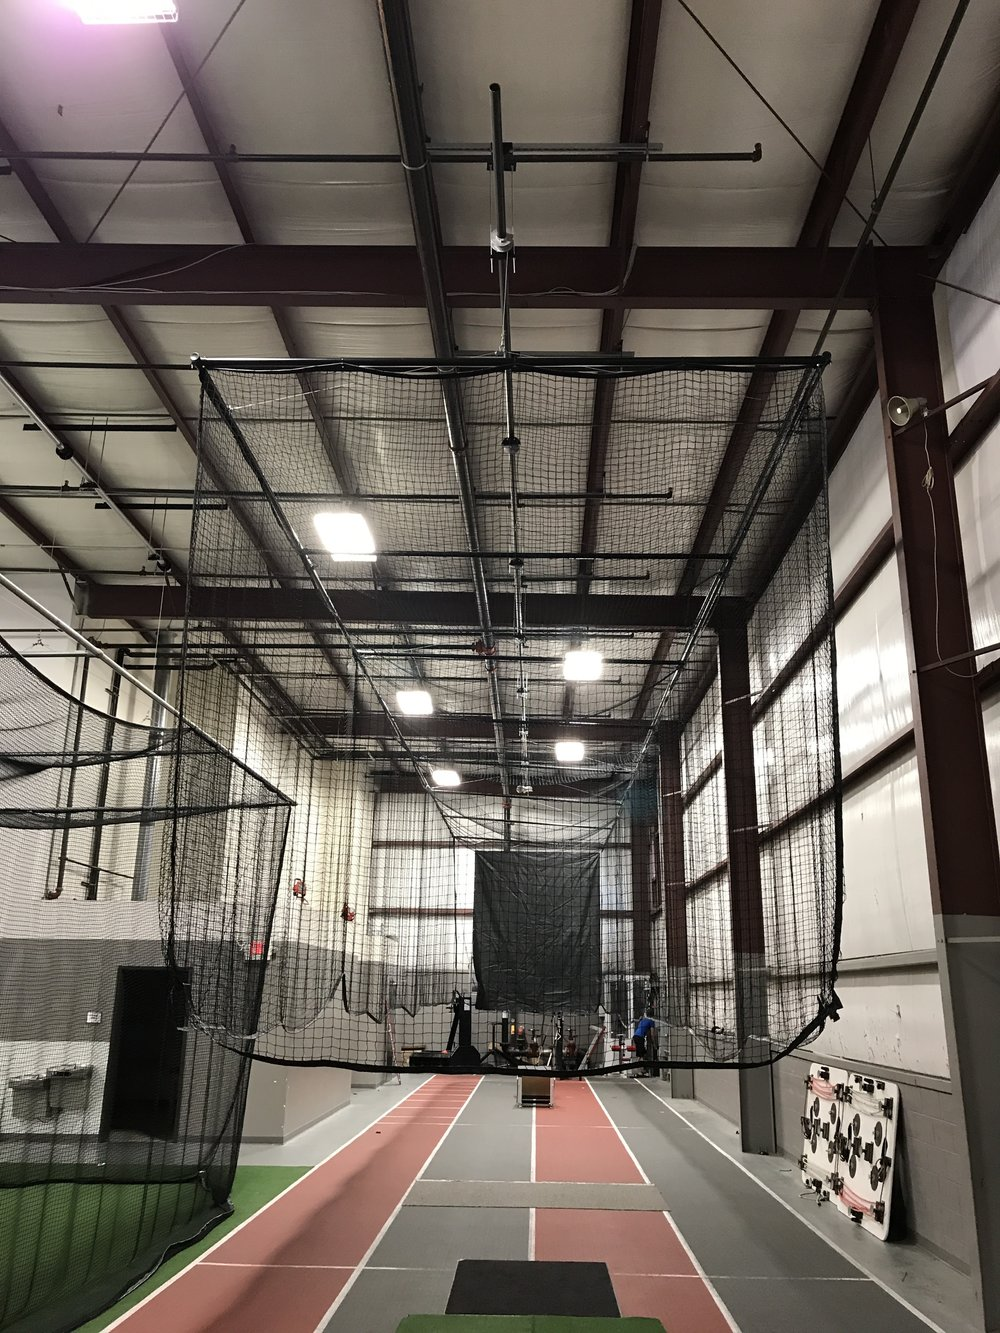 Multi-sport/batting tunnels